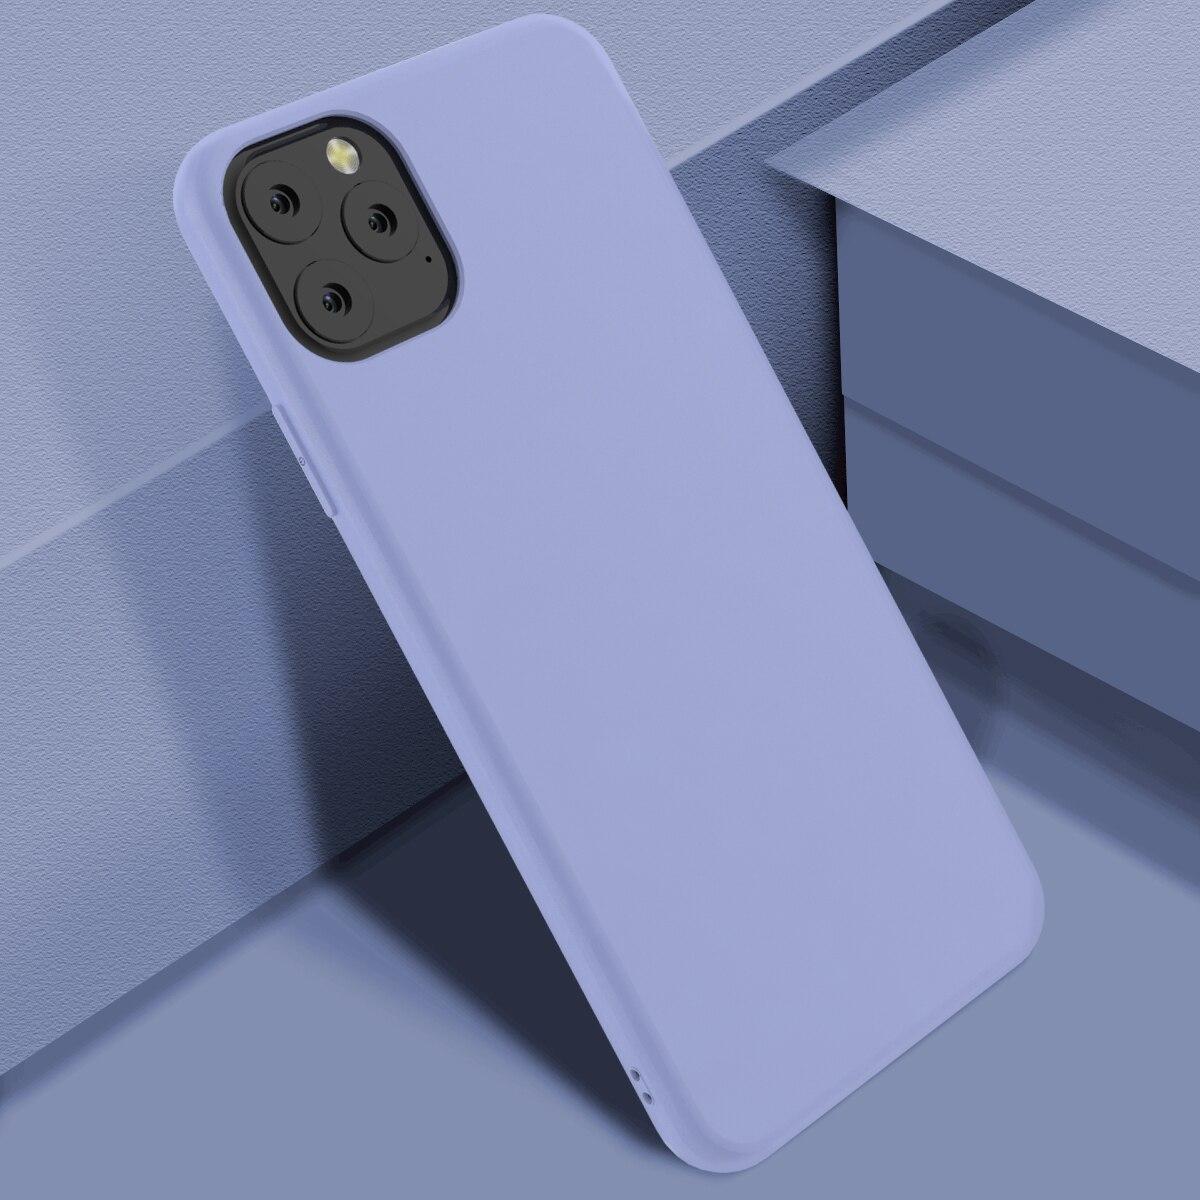 Torubia Silicone Case for iPhone 11/11 Pro/11 Pro Max 34